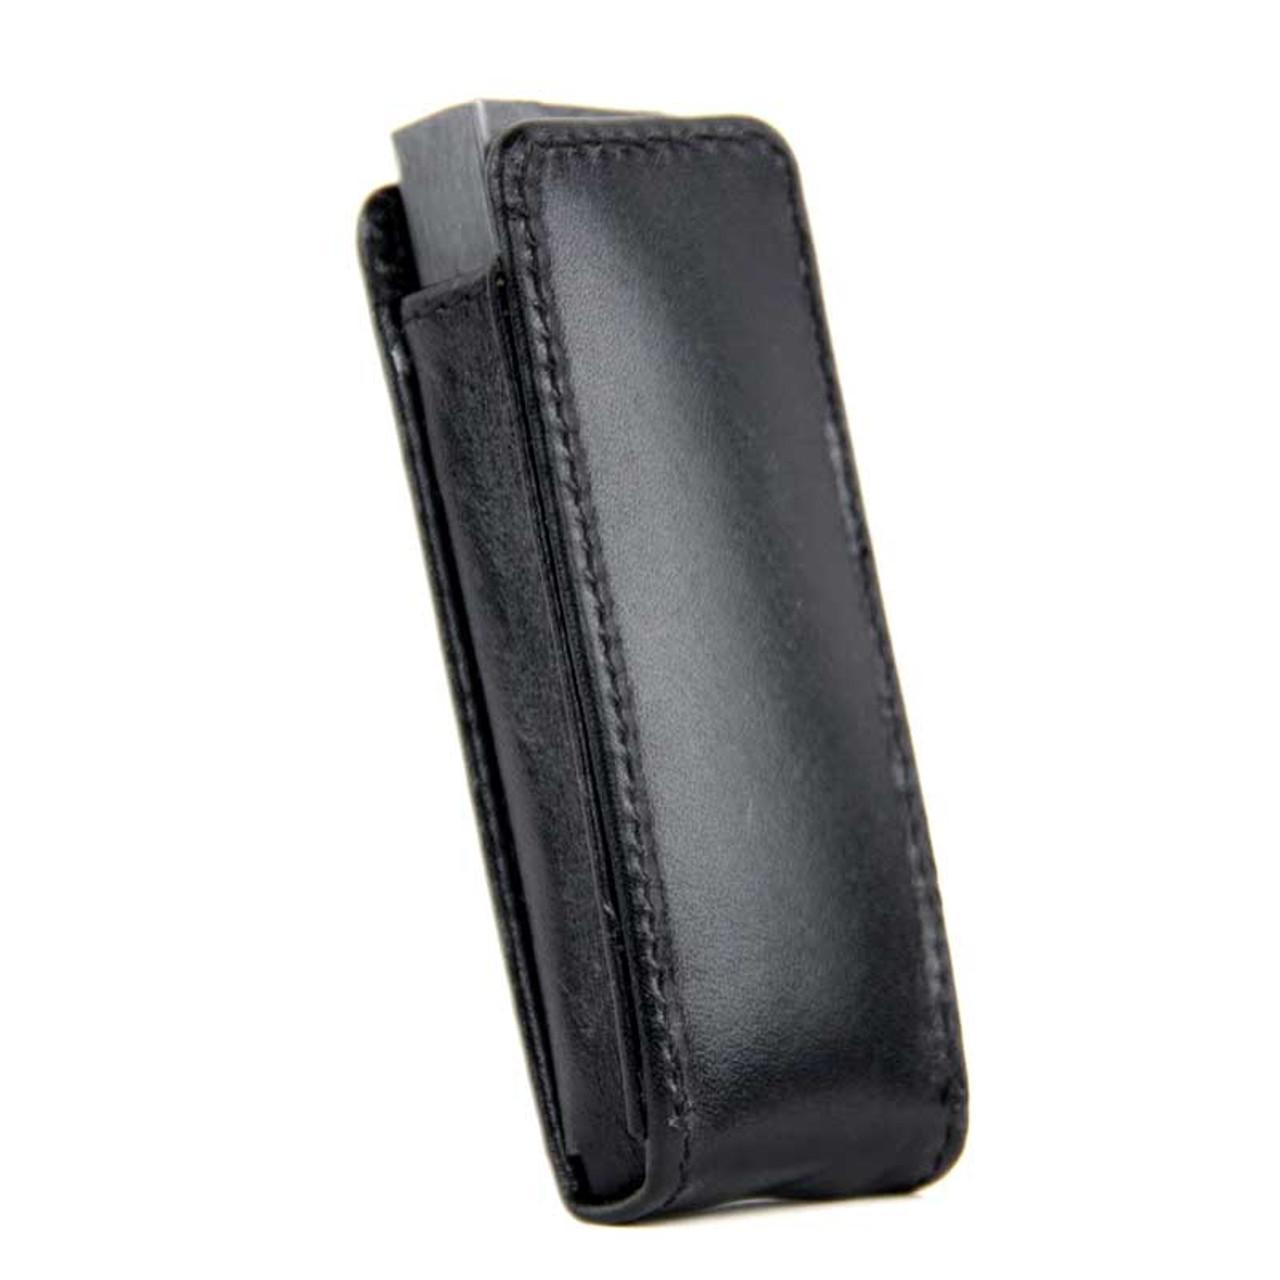 KelTec P32 Magazine Pocket Protector